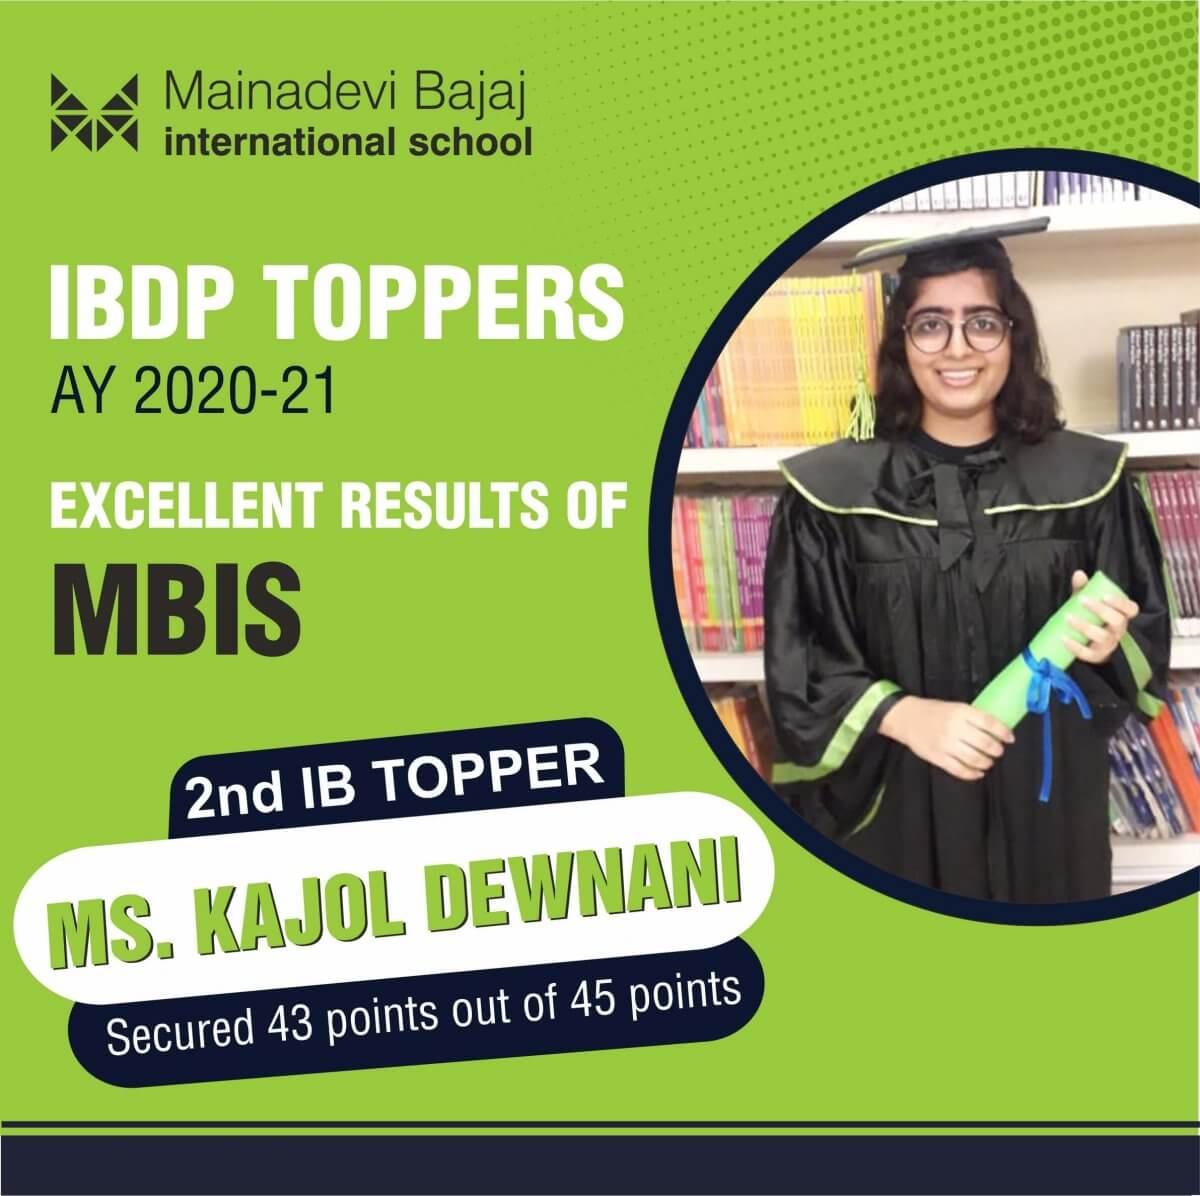 IBDP 2nd Topper Kajol Devnani